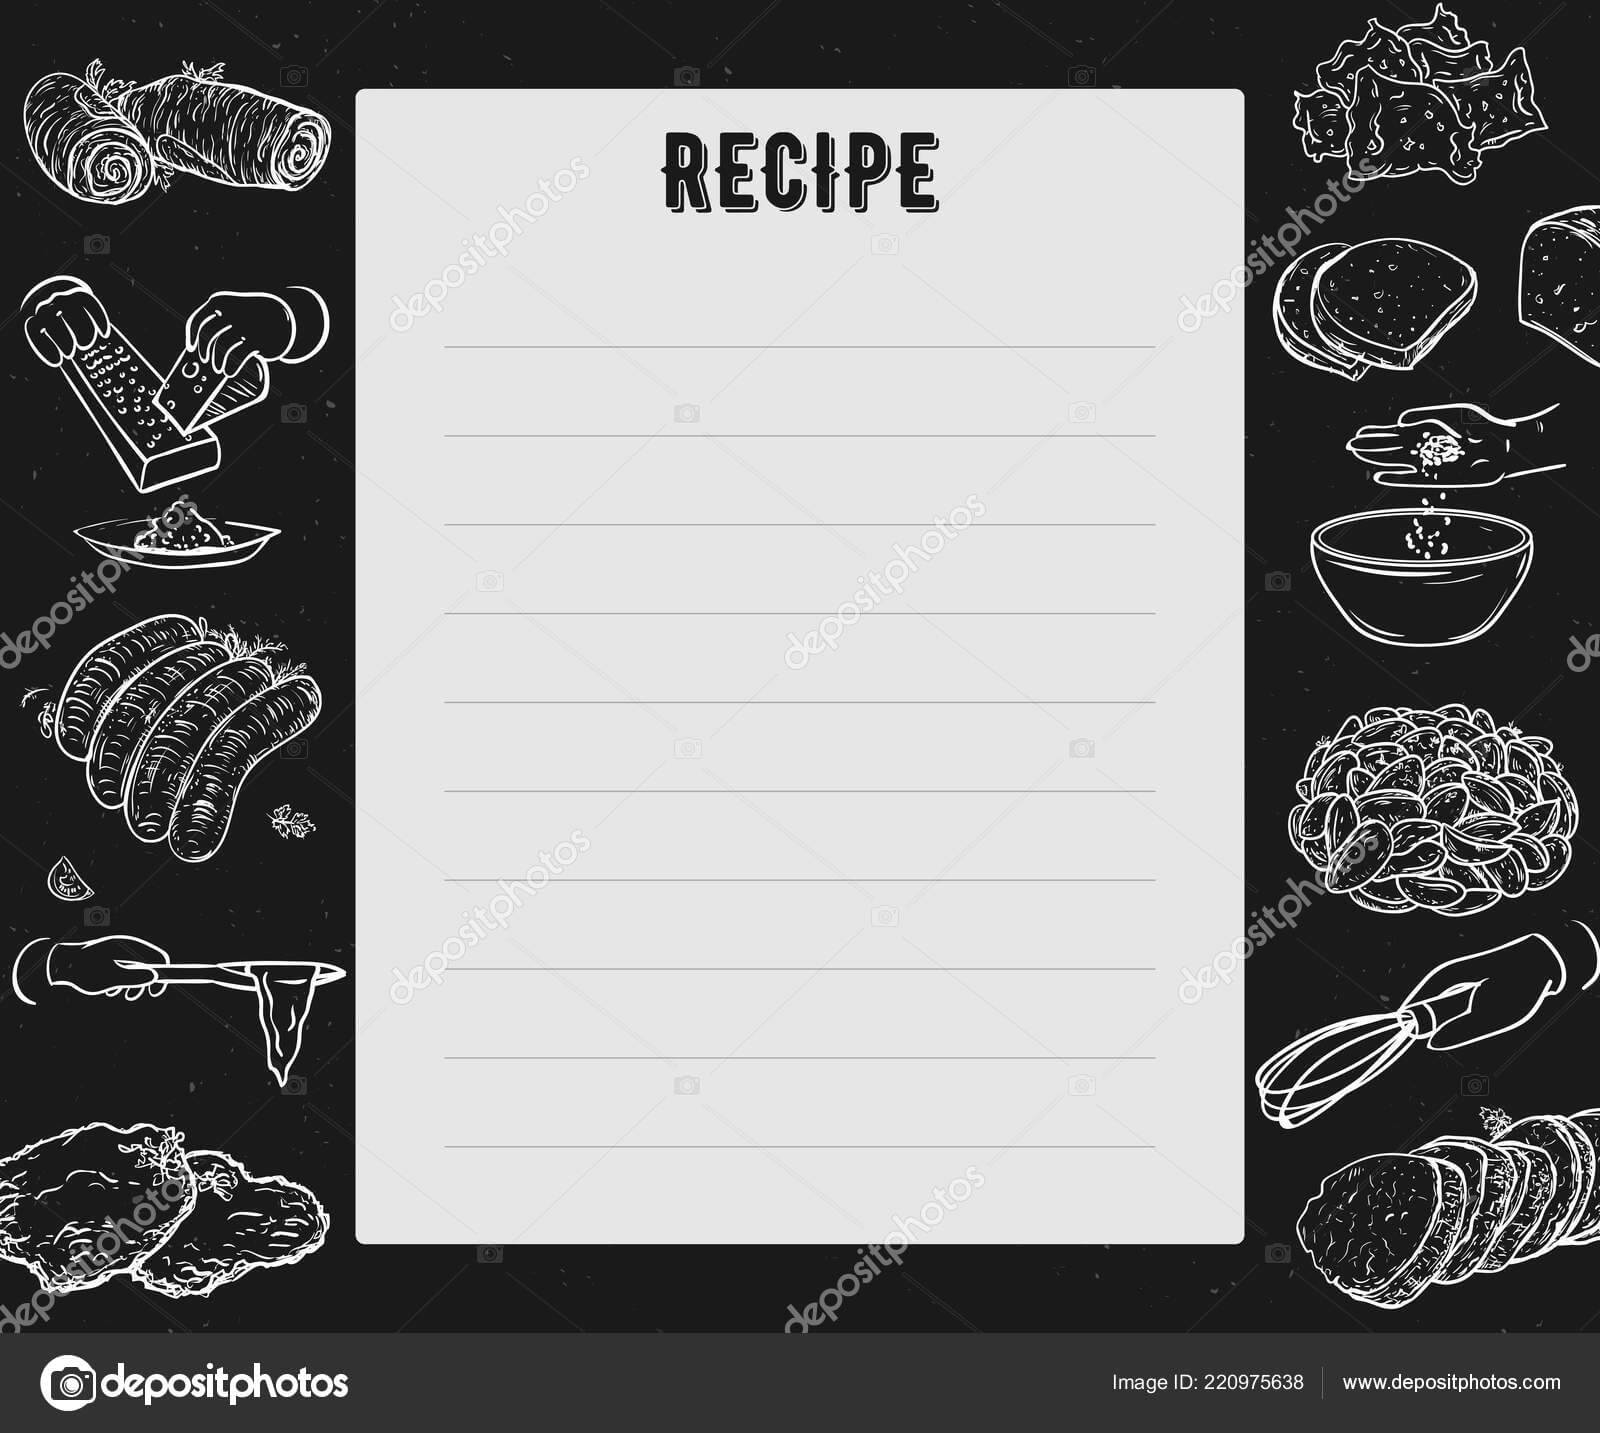 Recipe Card Cookbook Page Design Template Hands Preparing With Regard To Recipe Card Design Template